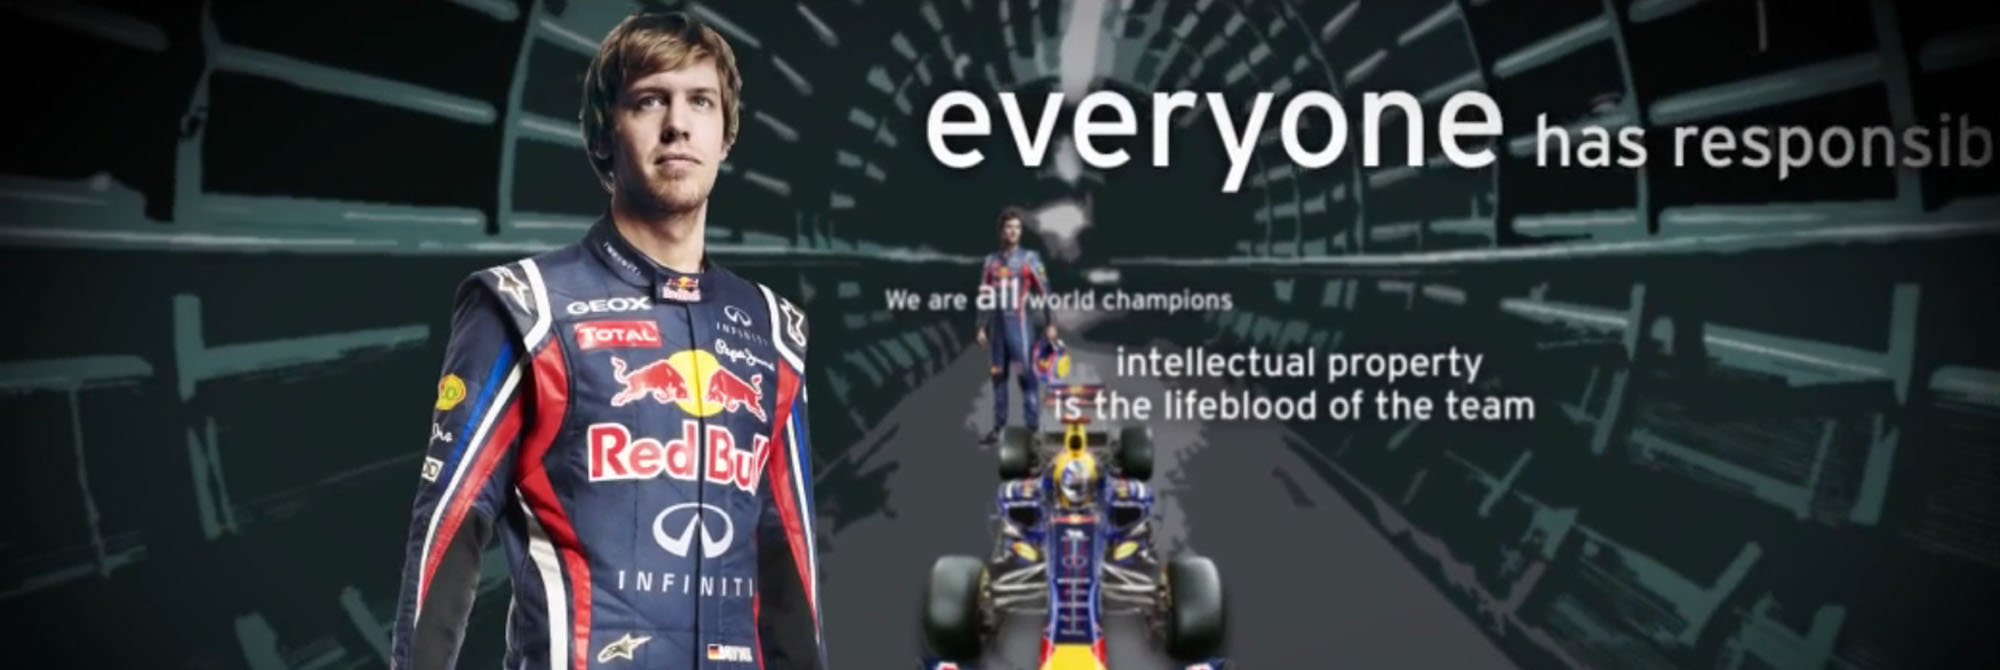 Still of film graphics from Red Bull Racing Internal Film